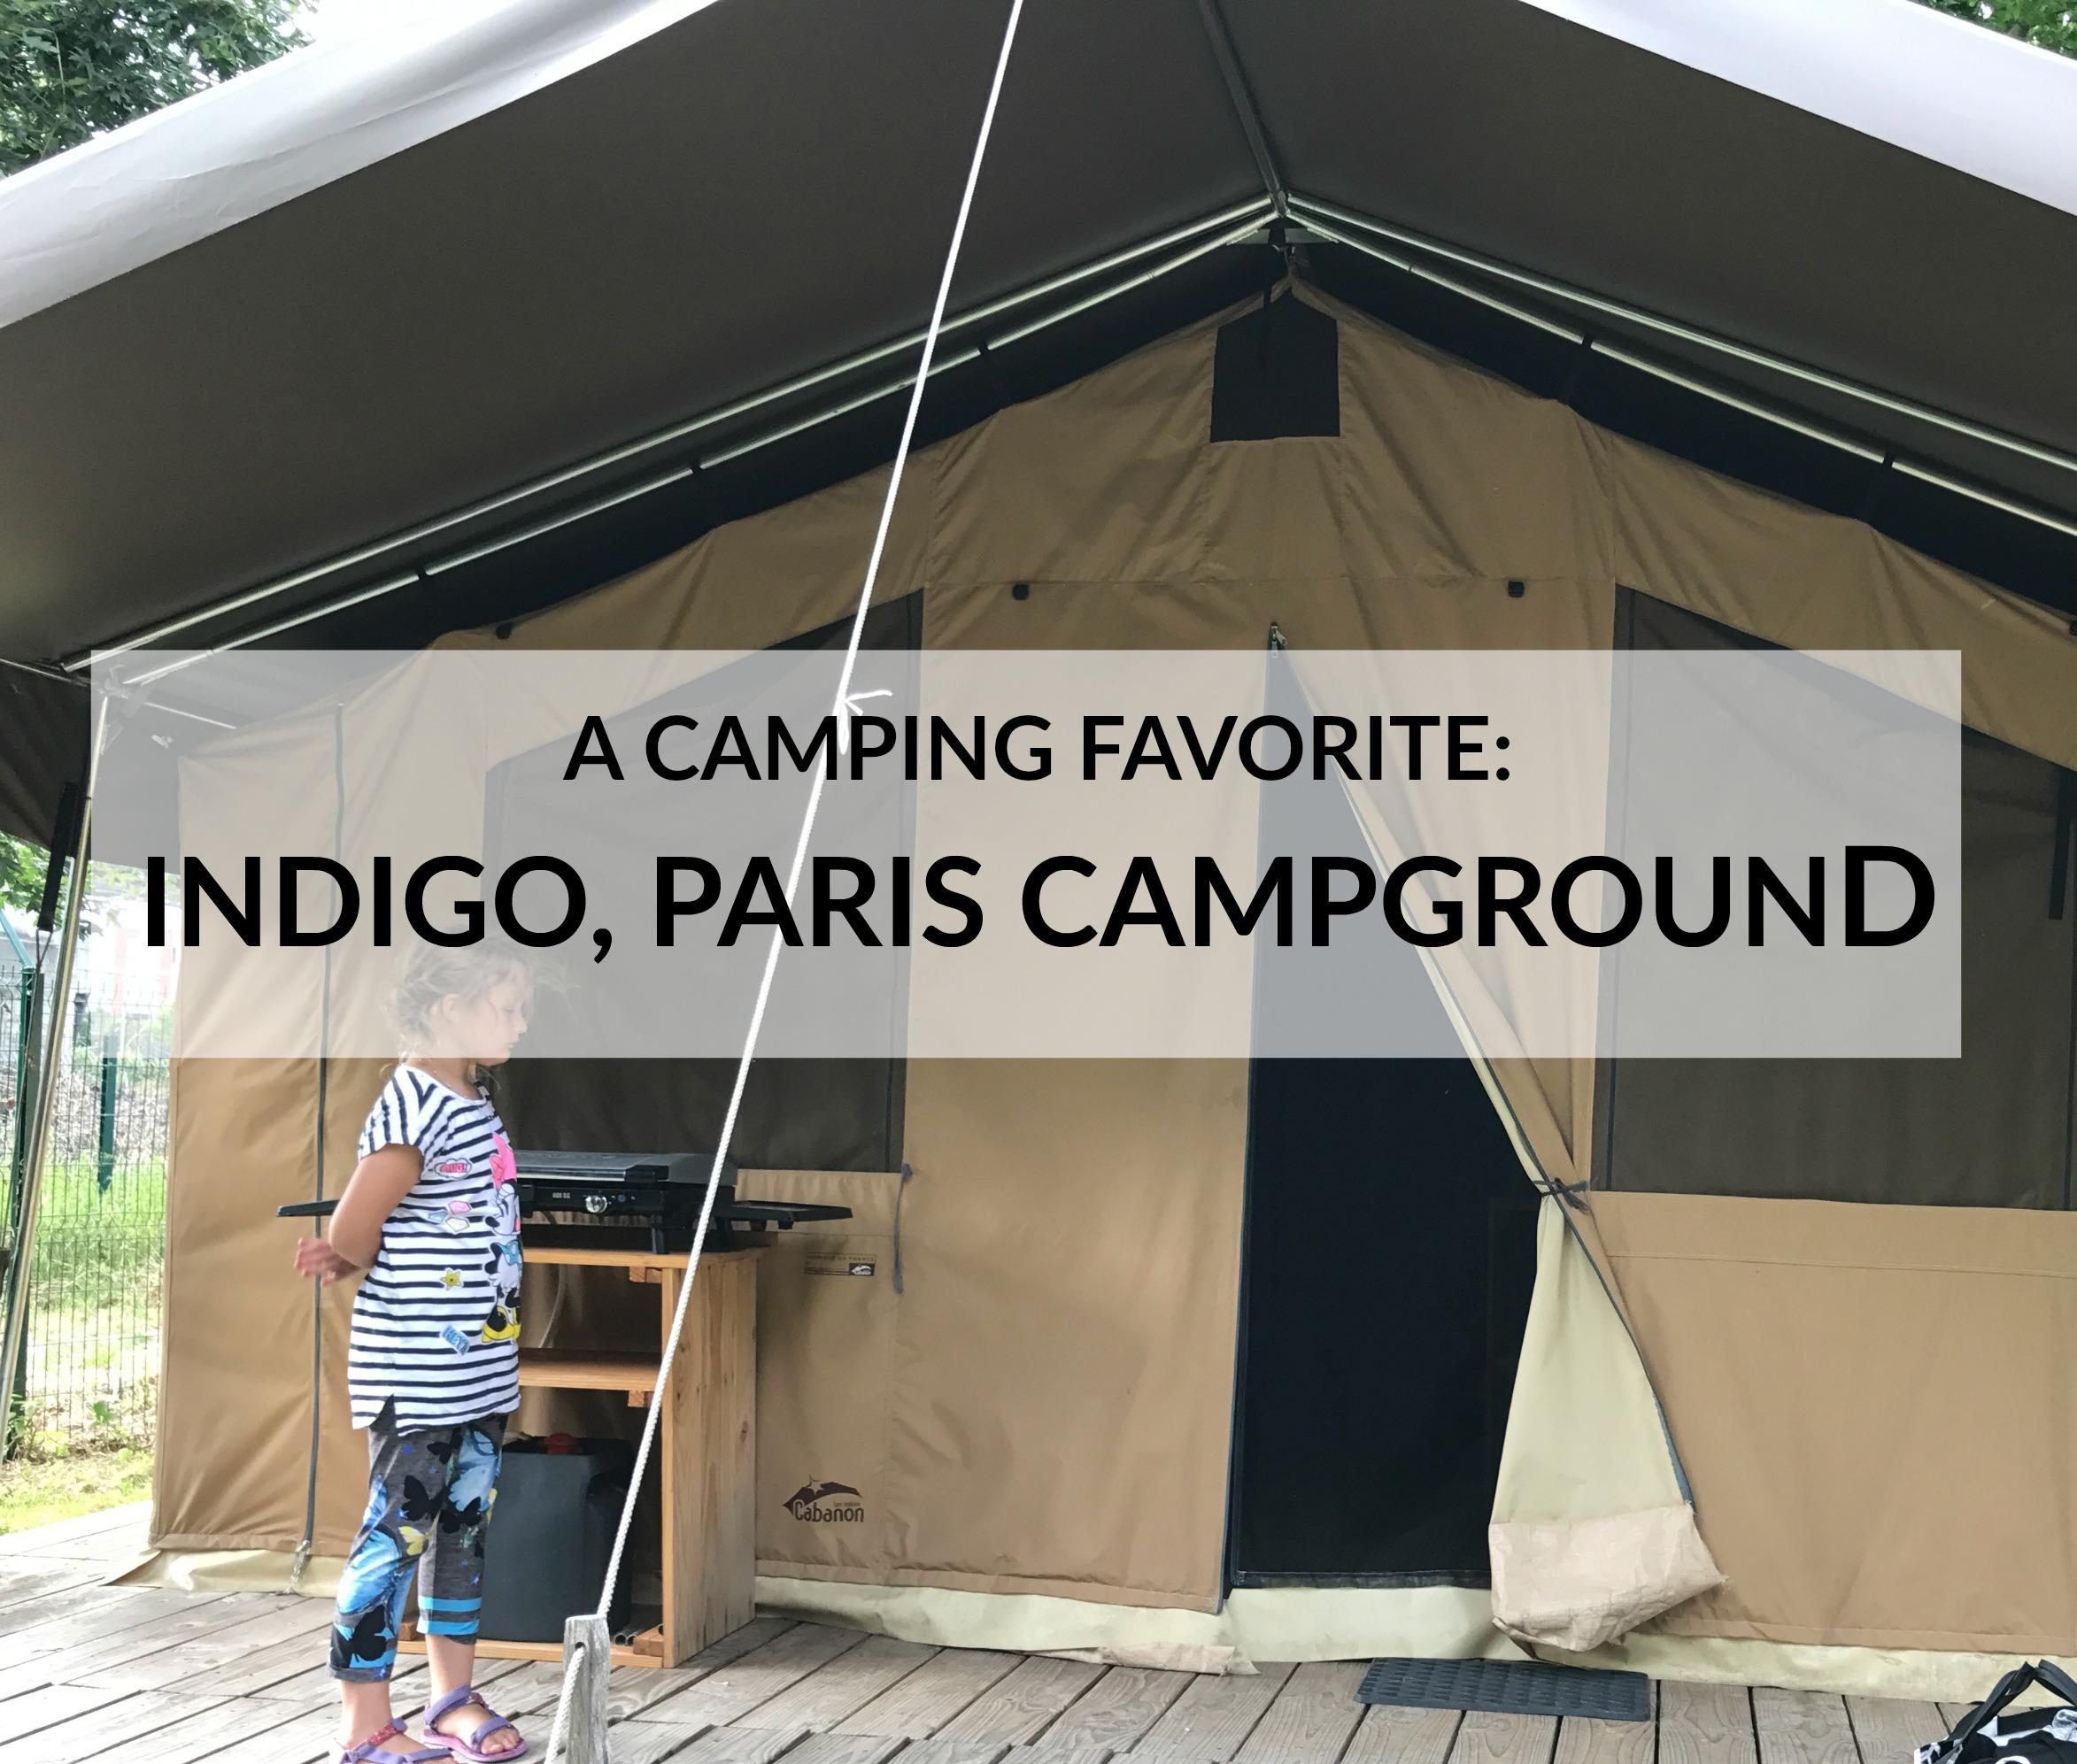 Paris Campground